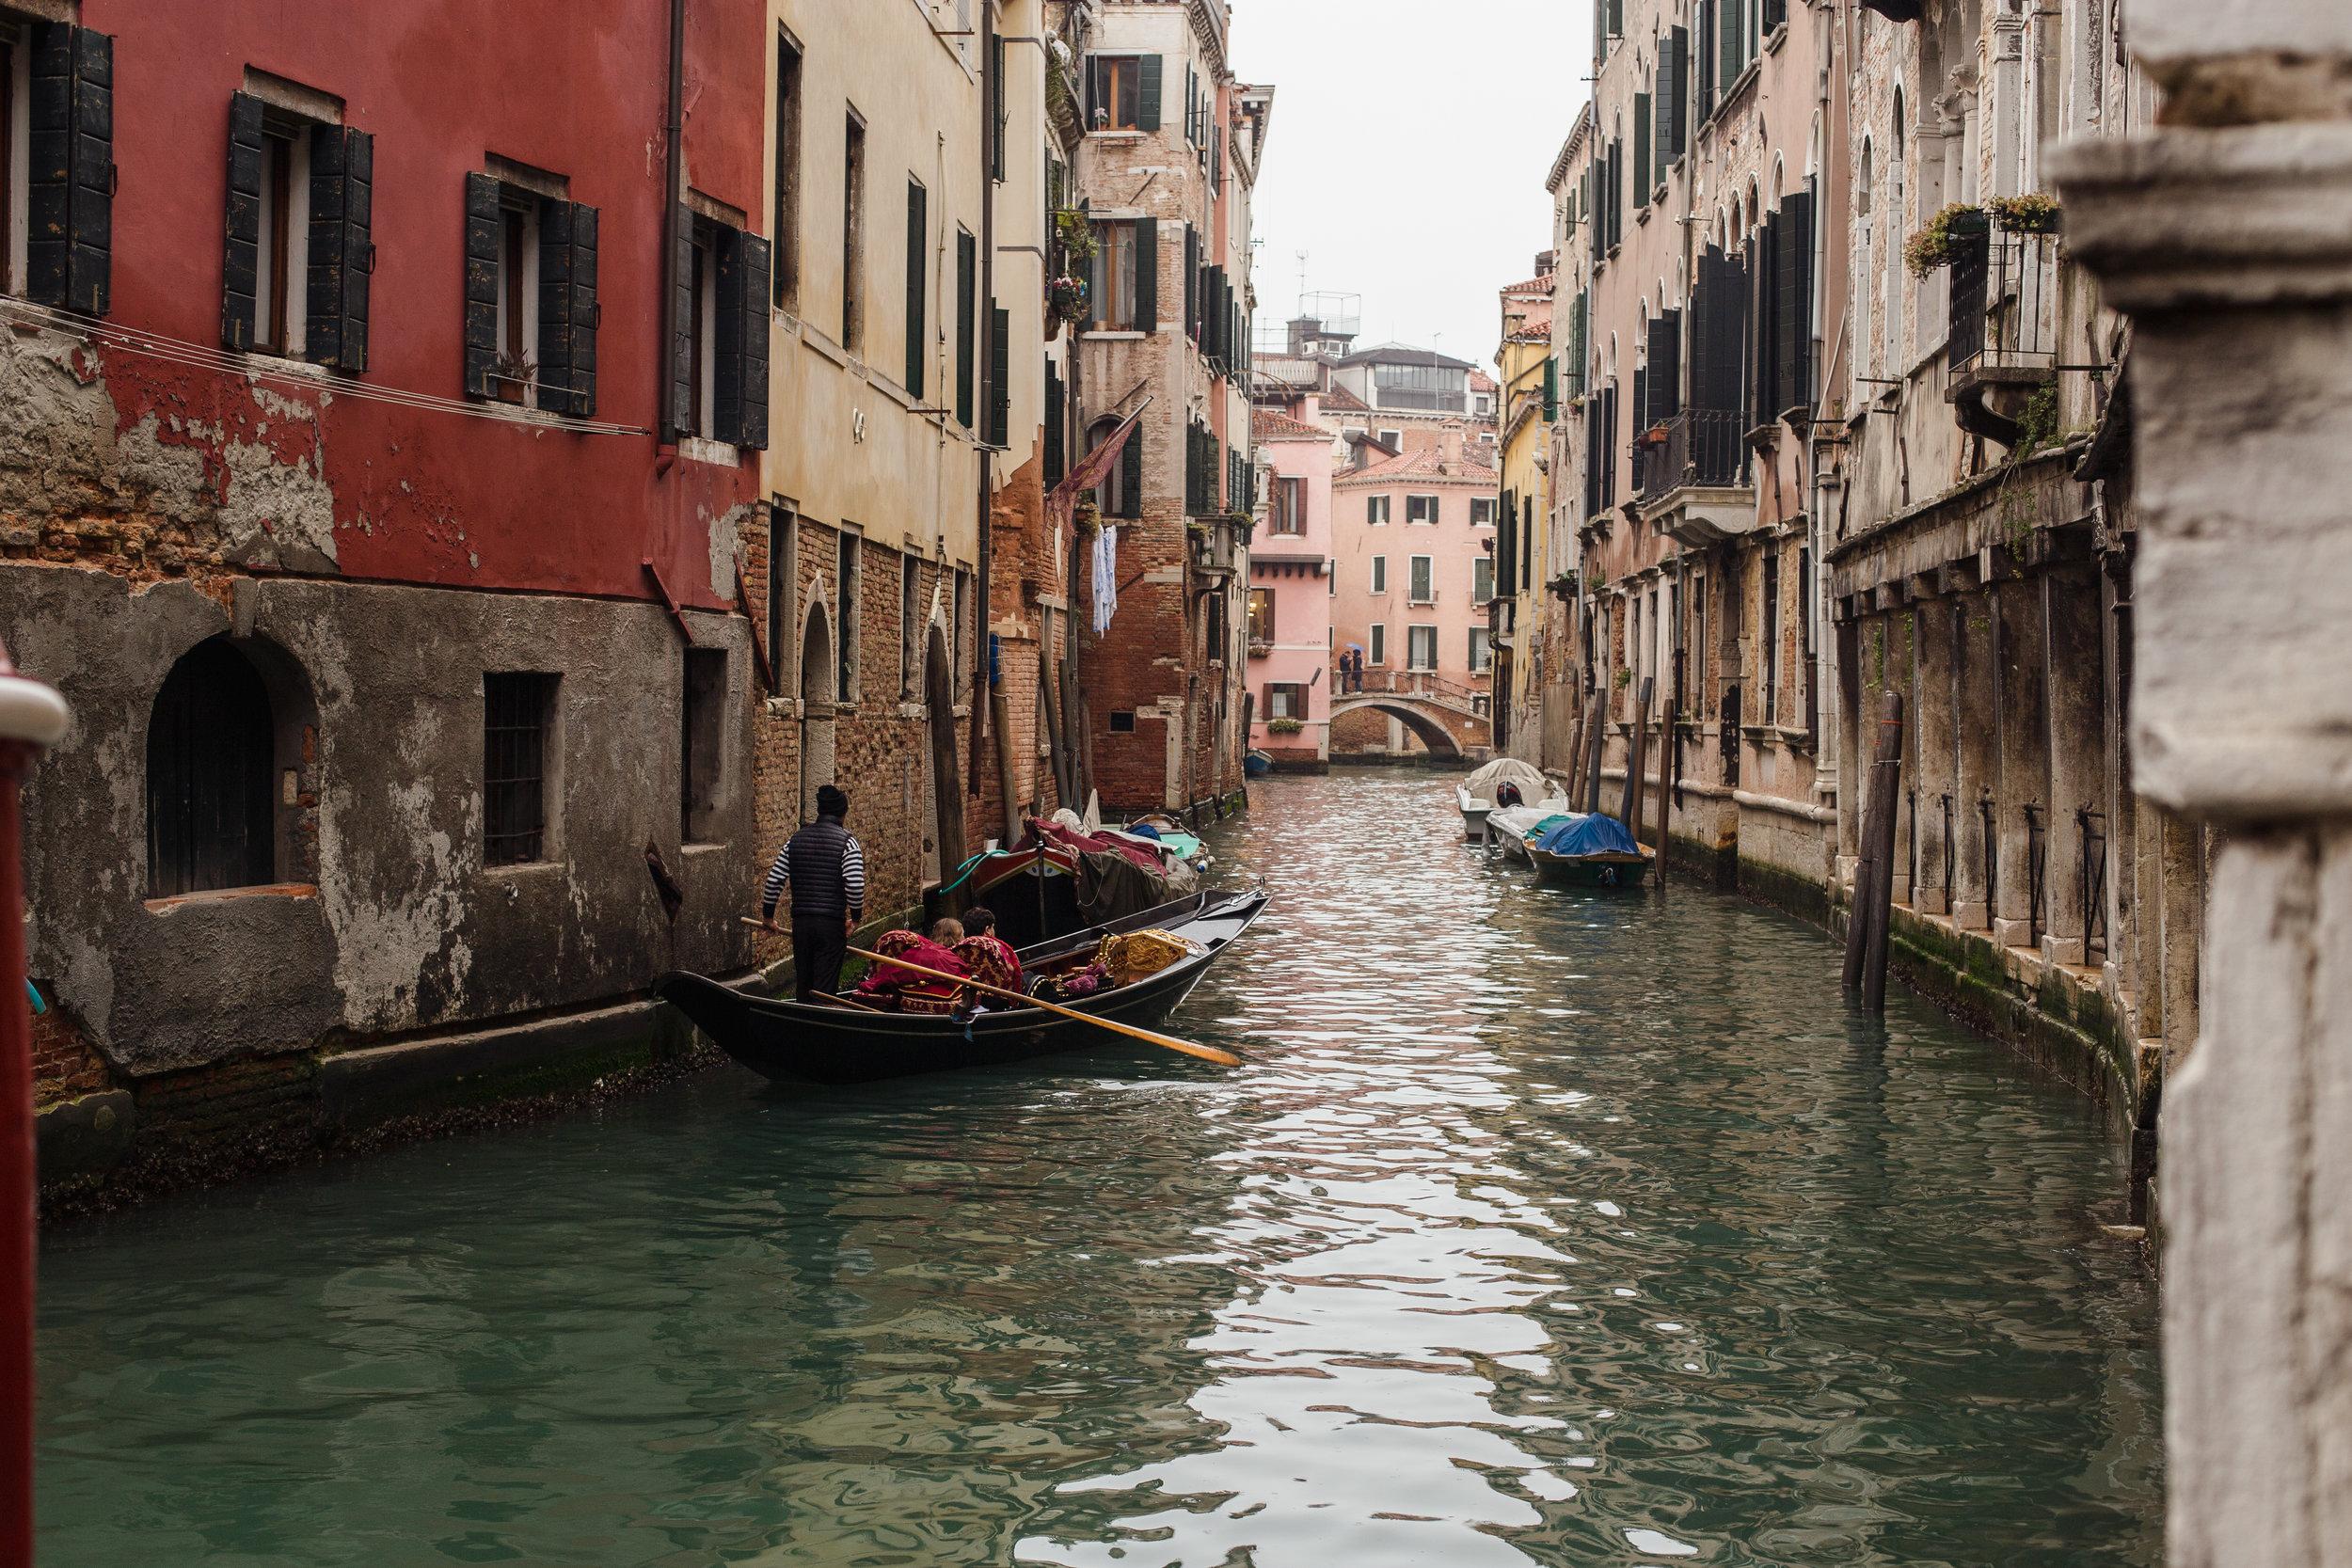 Venice, Italy - March 2018